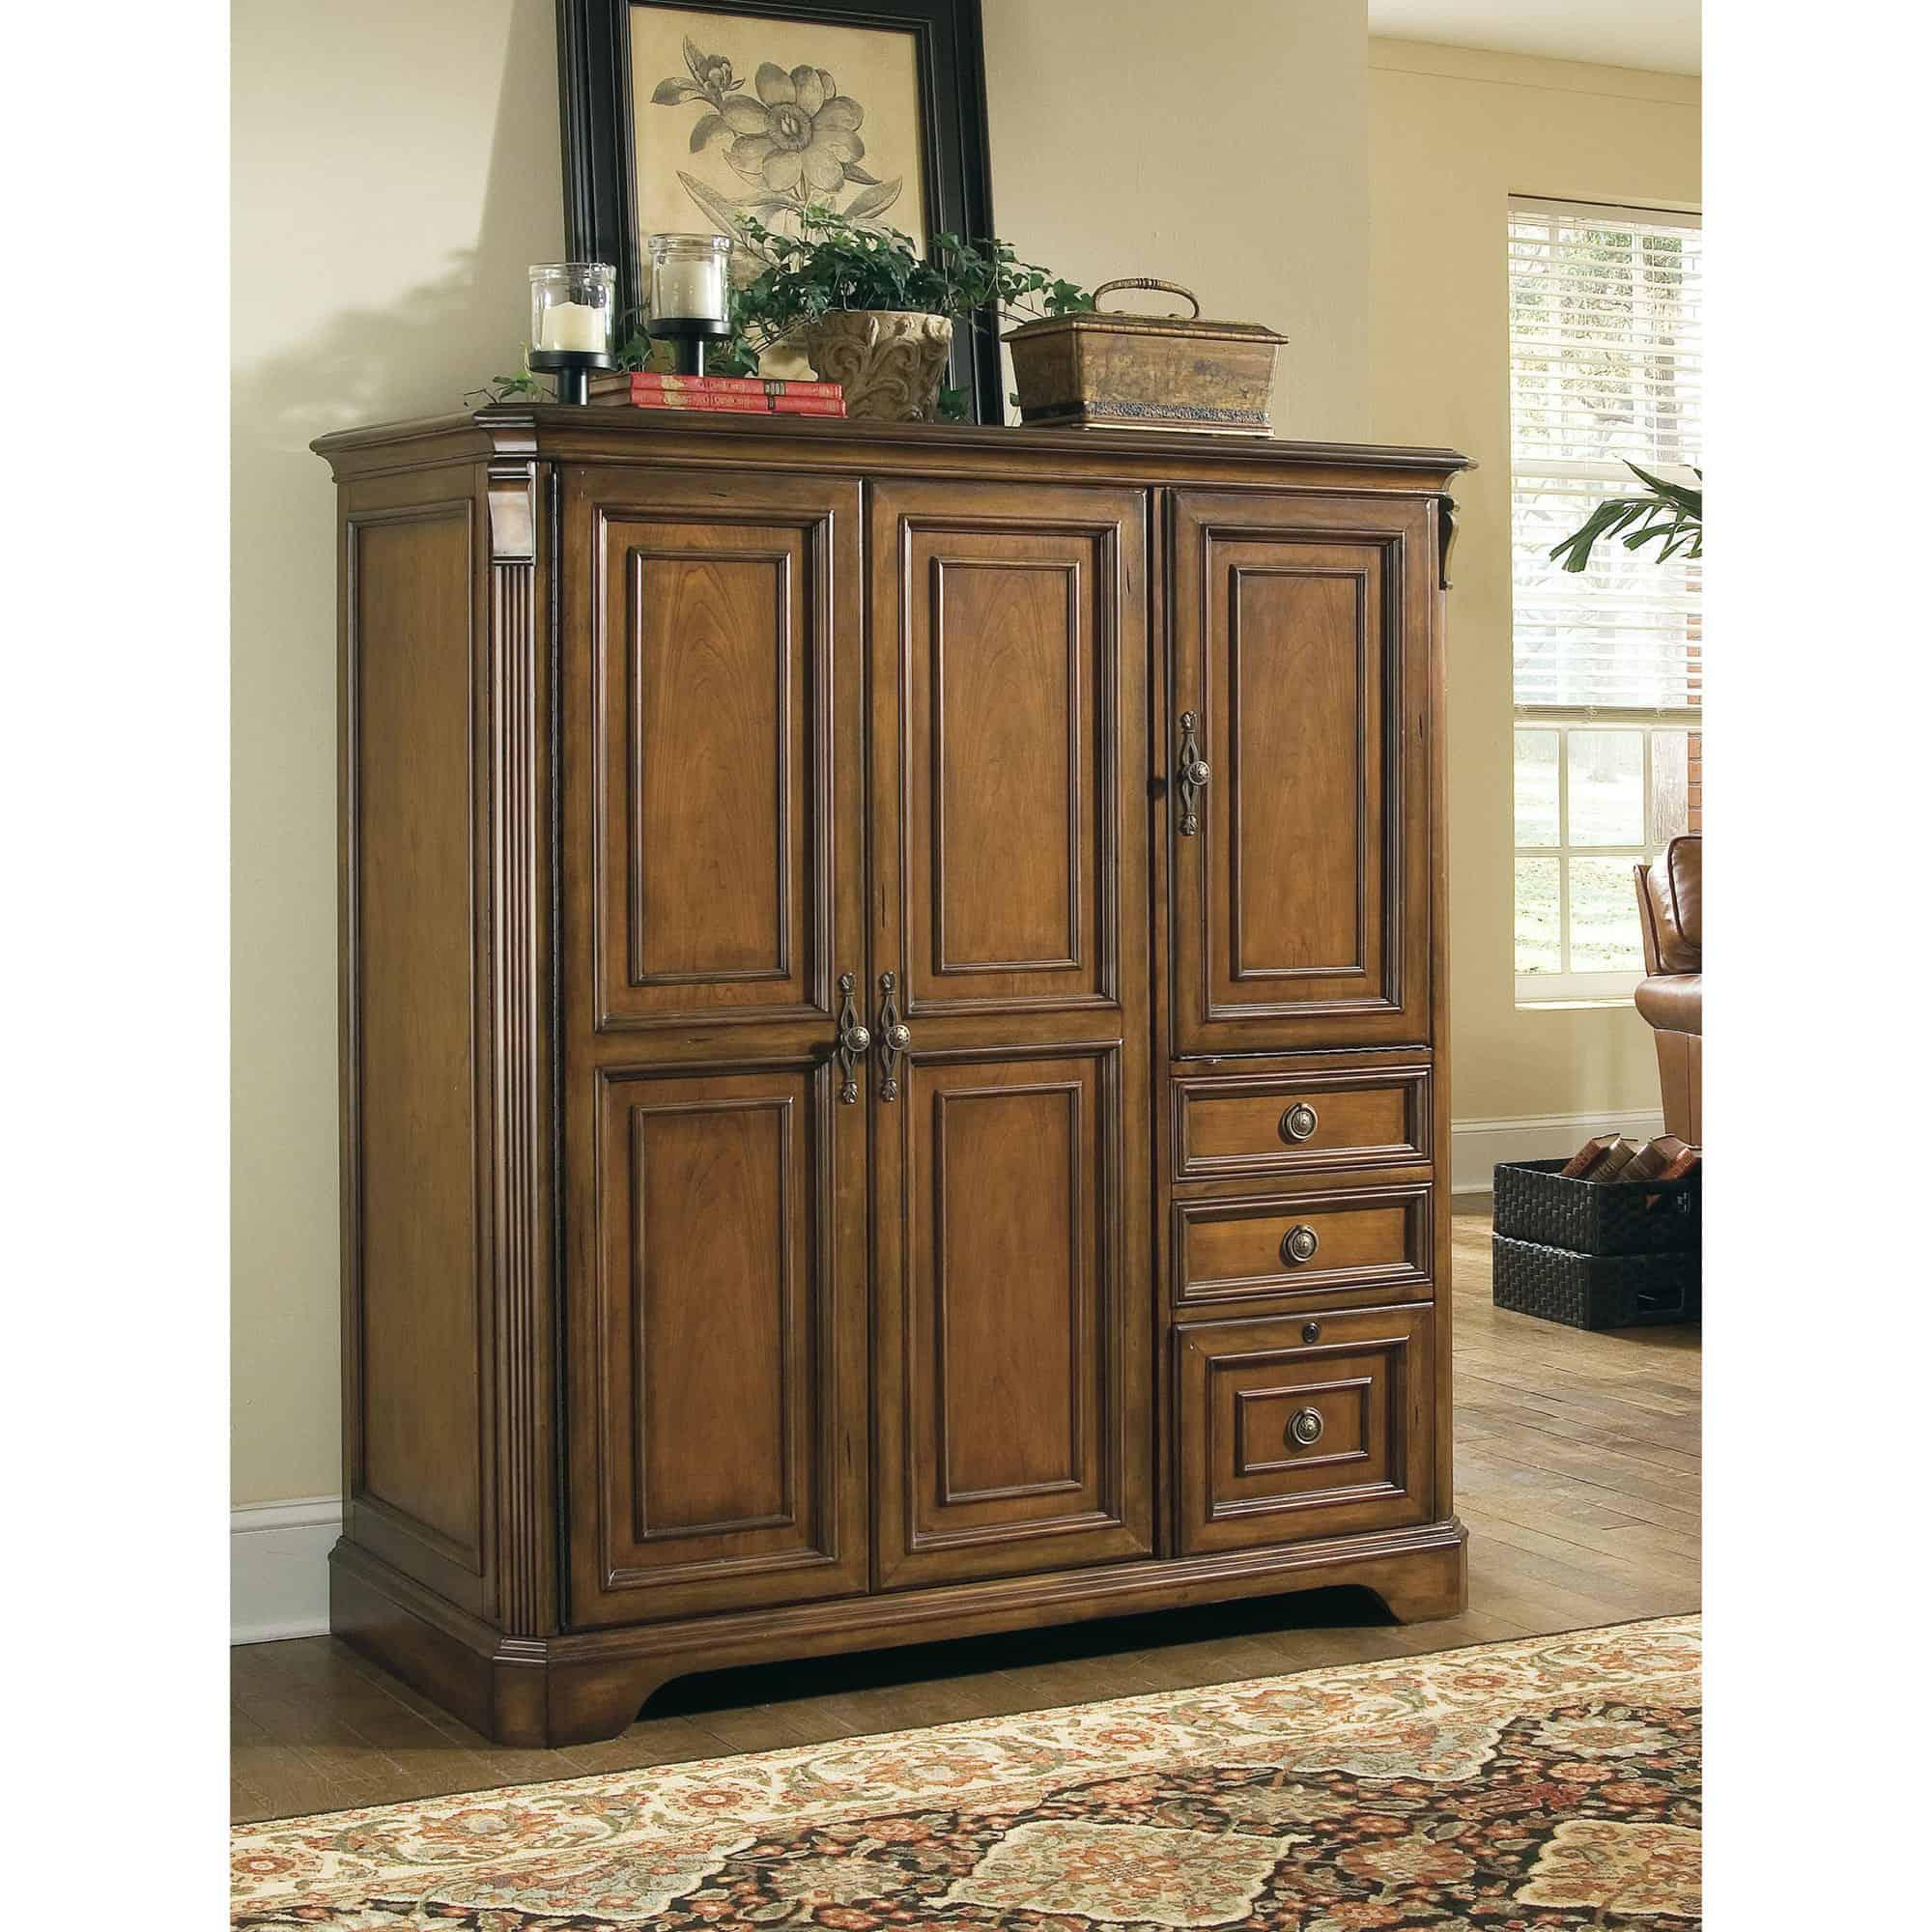 Brookhaven Kitchen Cabinets: Brookhaven Computer Cabinet 281-10-309